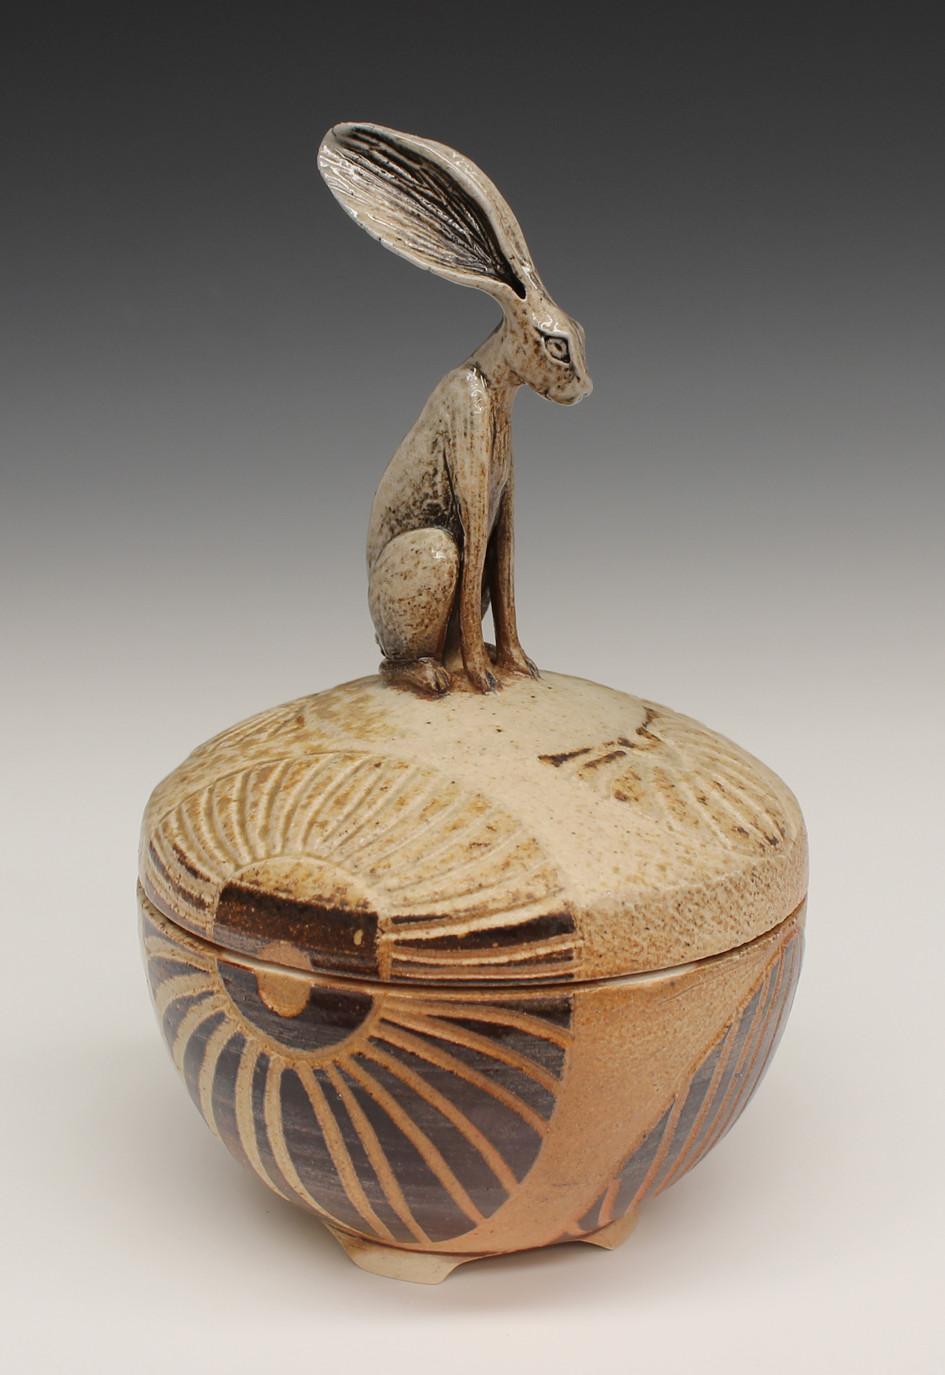 Long Eared Hare